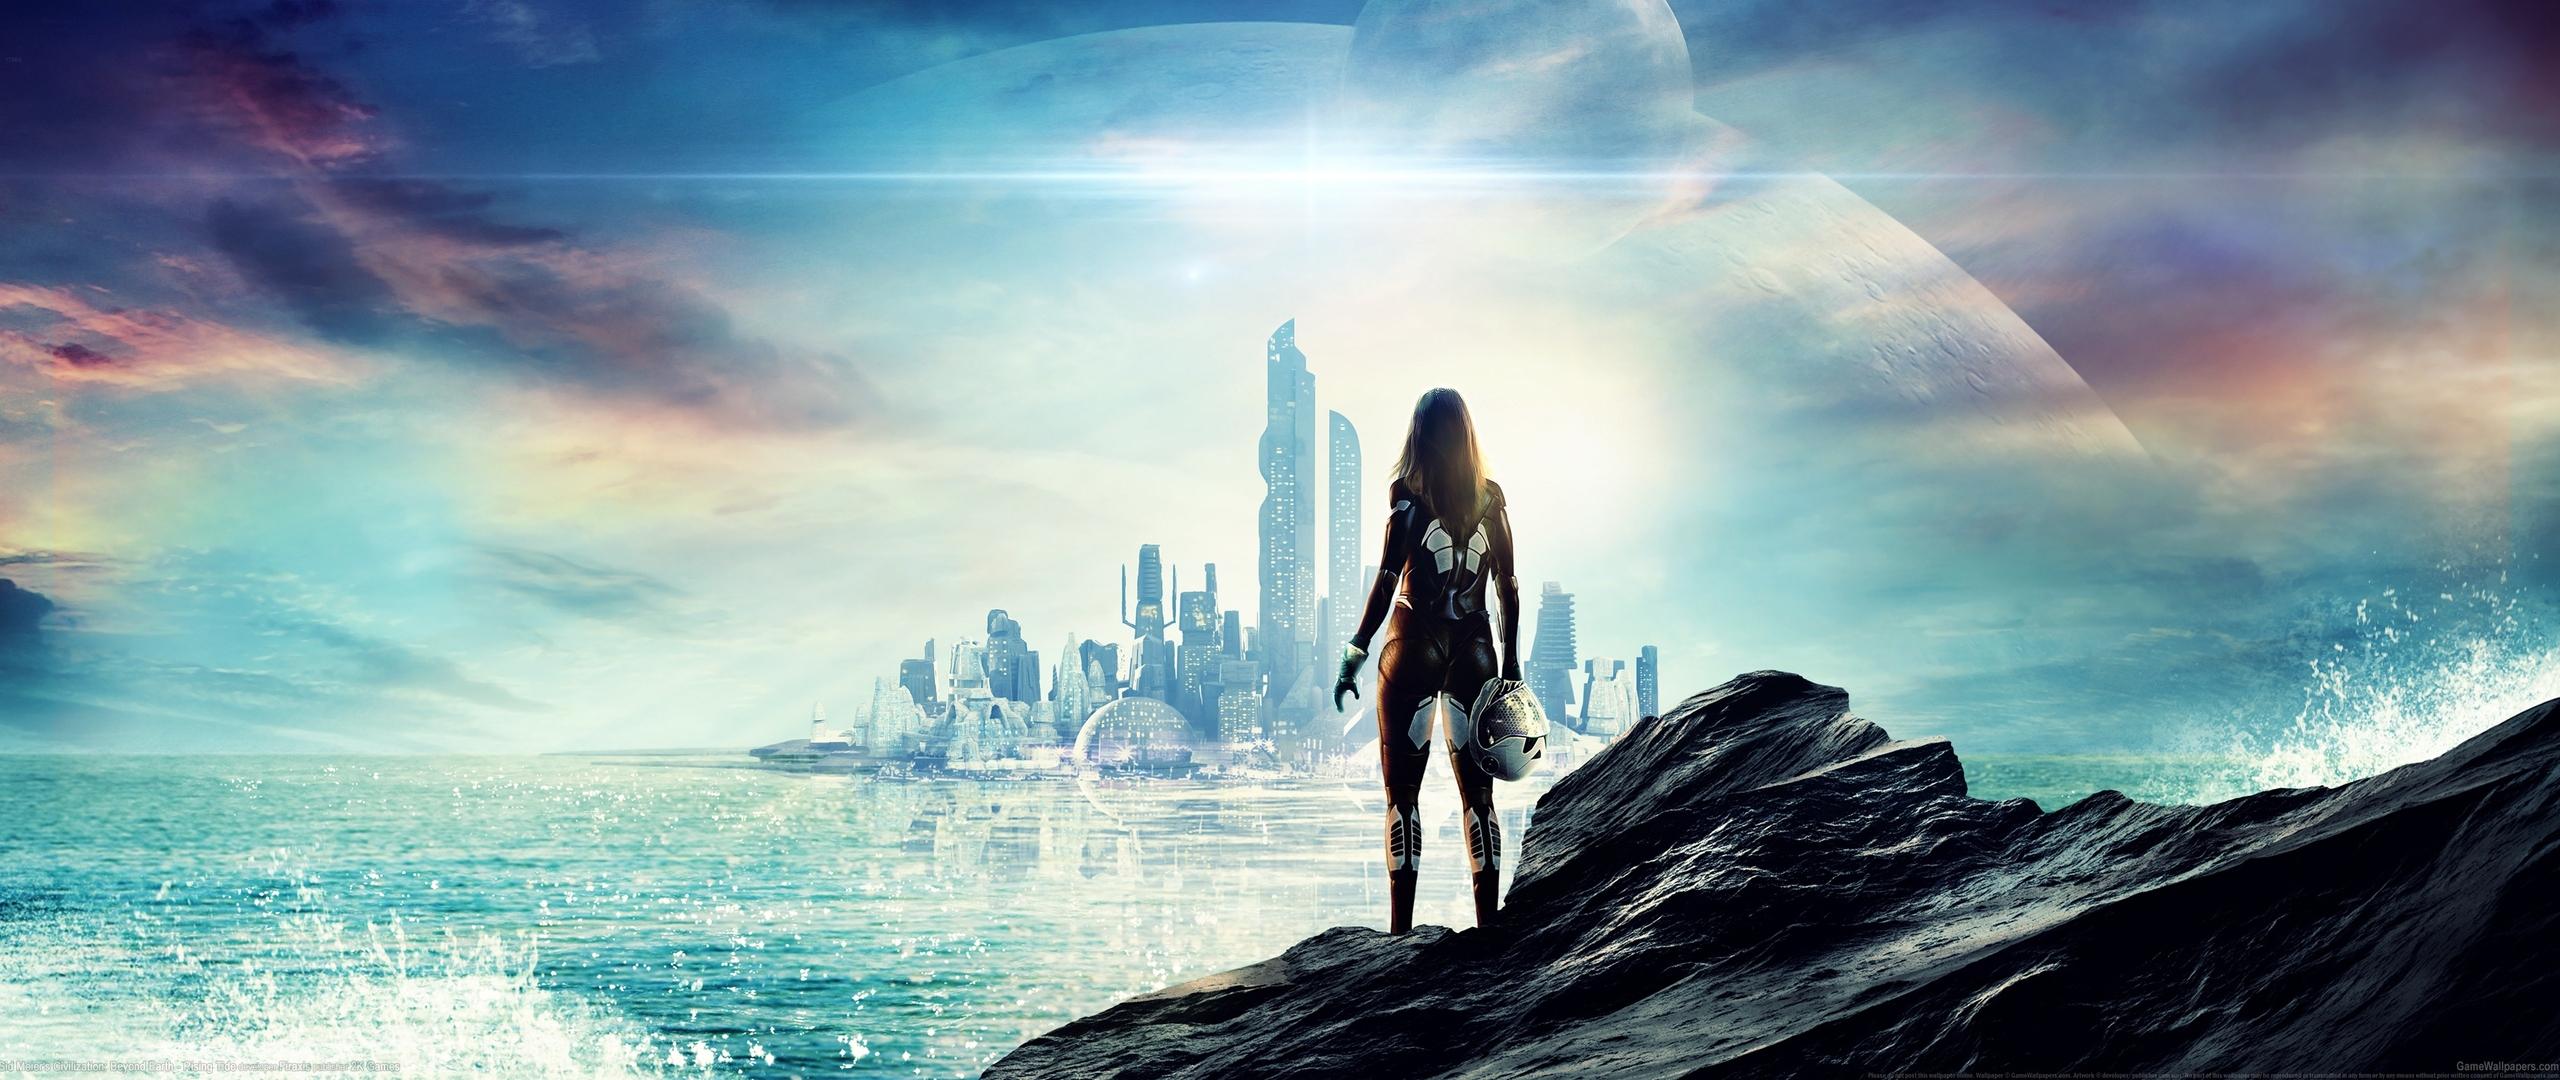 civilization-beyond-earth-4k-qf.jpg